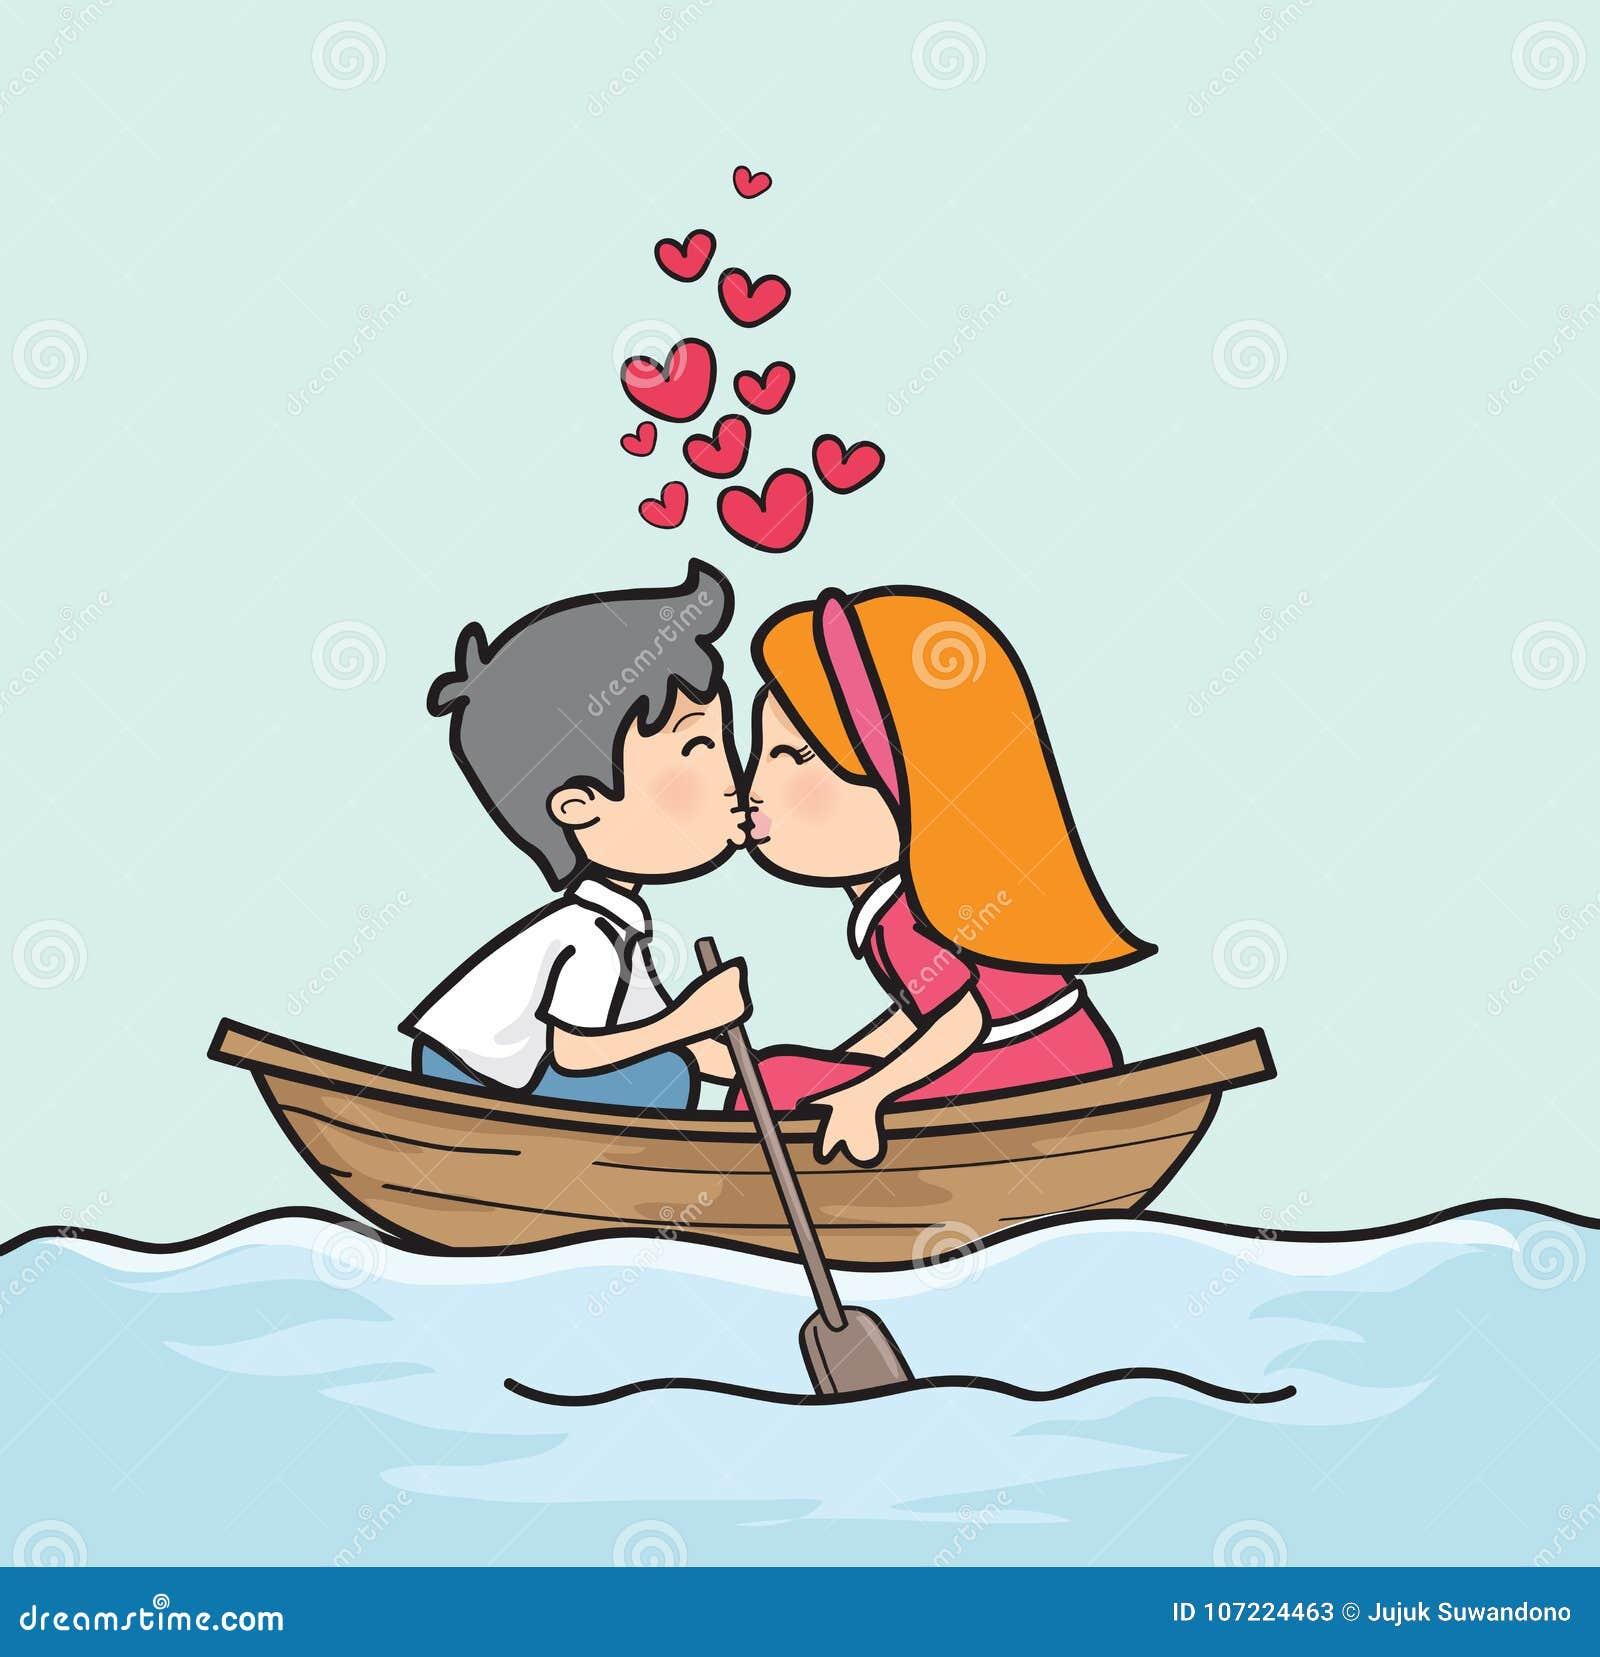 Cartoon Cute Couple Kissing Stock Illustrations 1 505 Cartoon Cute Couple Kissing Stock Illustrations Vectors Clipart Dreamstime